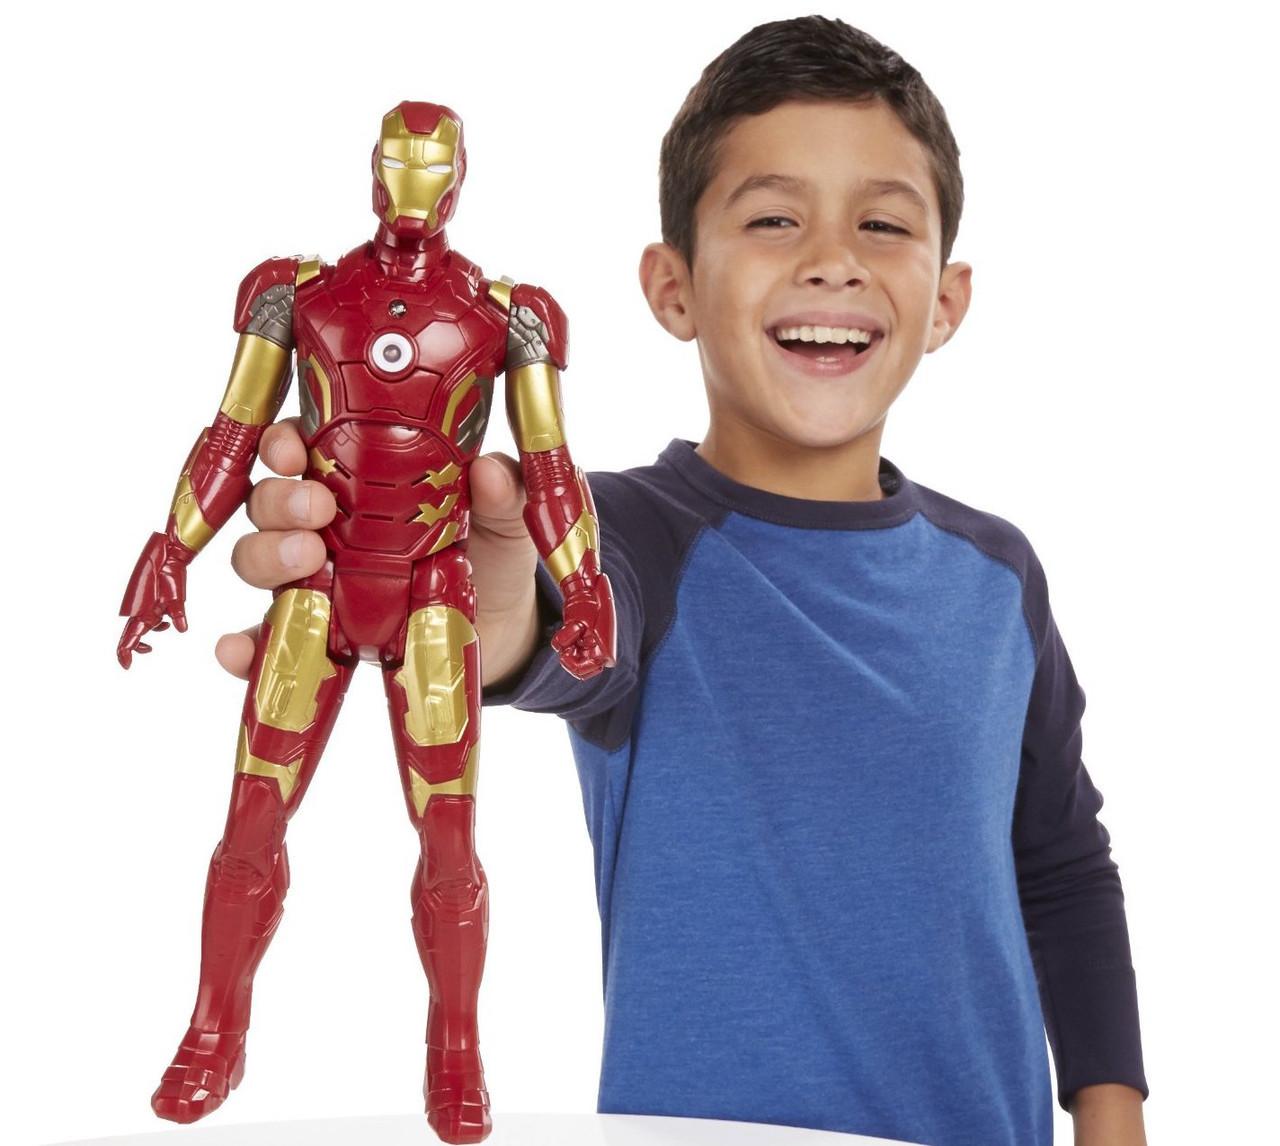 Говорящий Железный человек Марк 43, Титаны - Iron Man Mark 43, Titans, Avengers, Hasbro